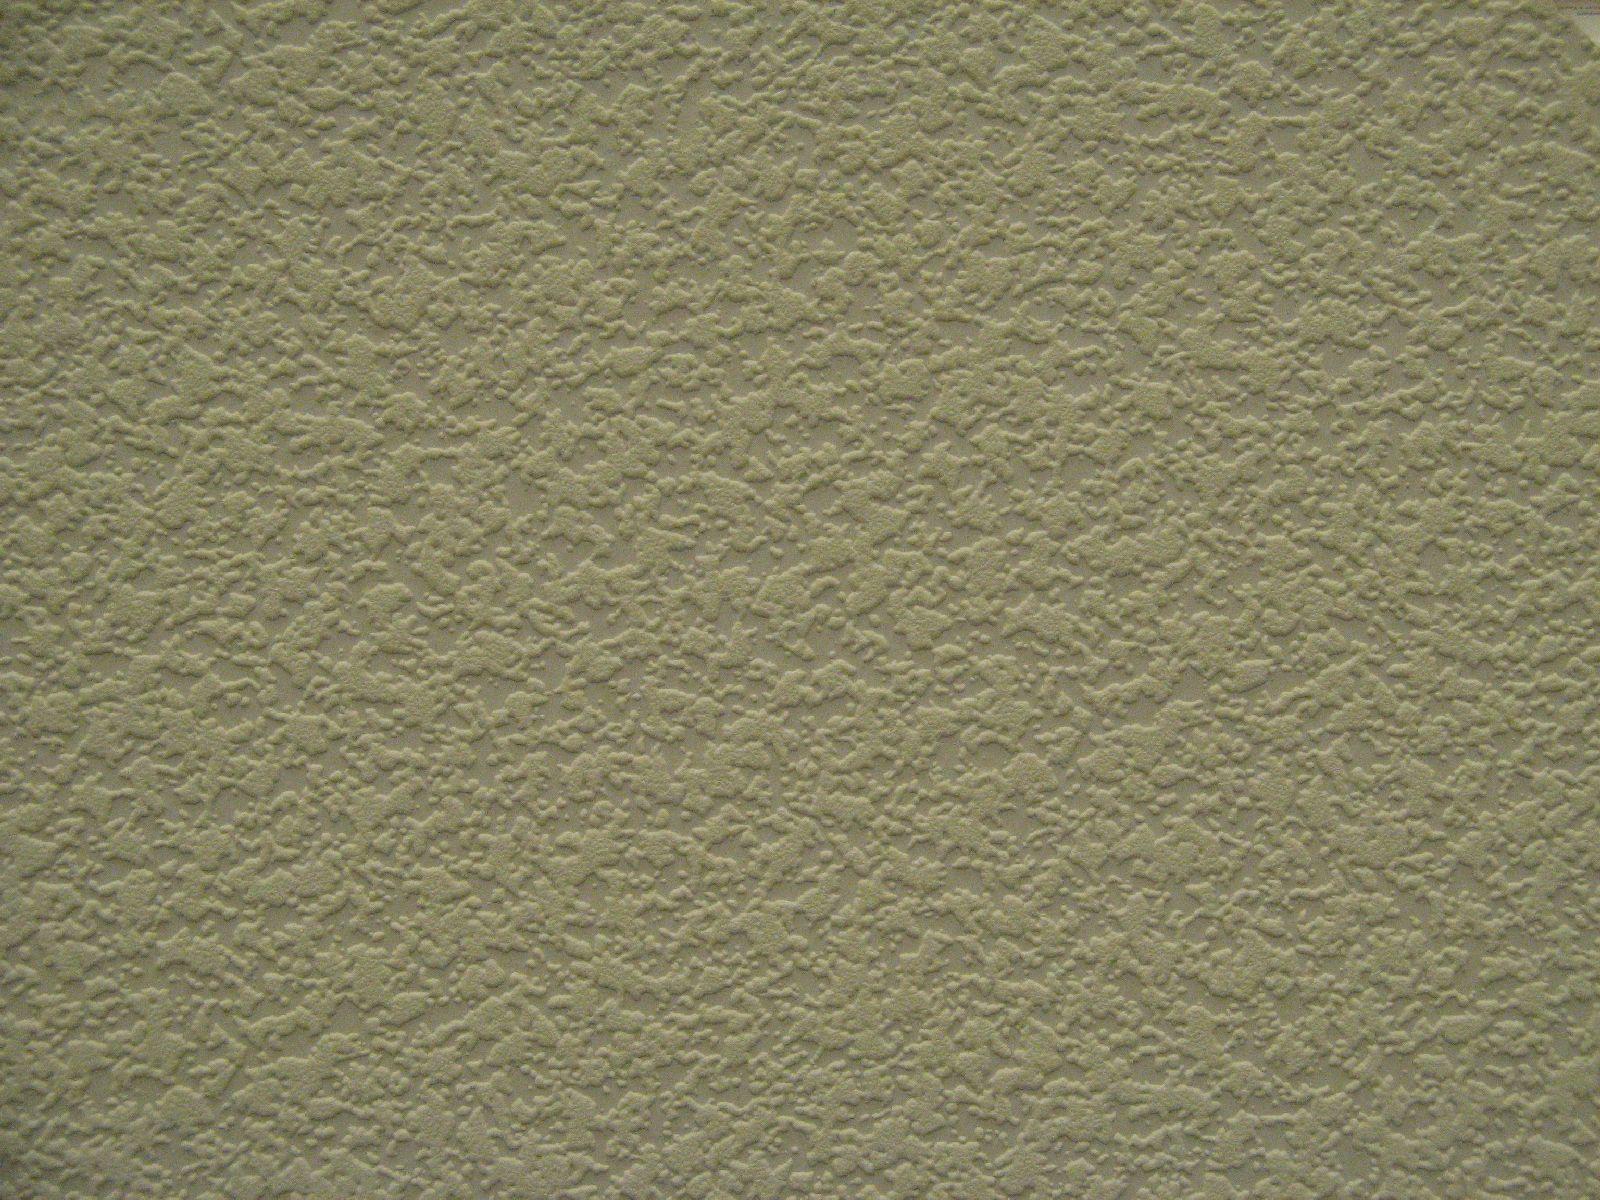 Wallpaper Interior Texture Interior Exterior Doors Design 1600x1200